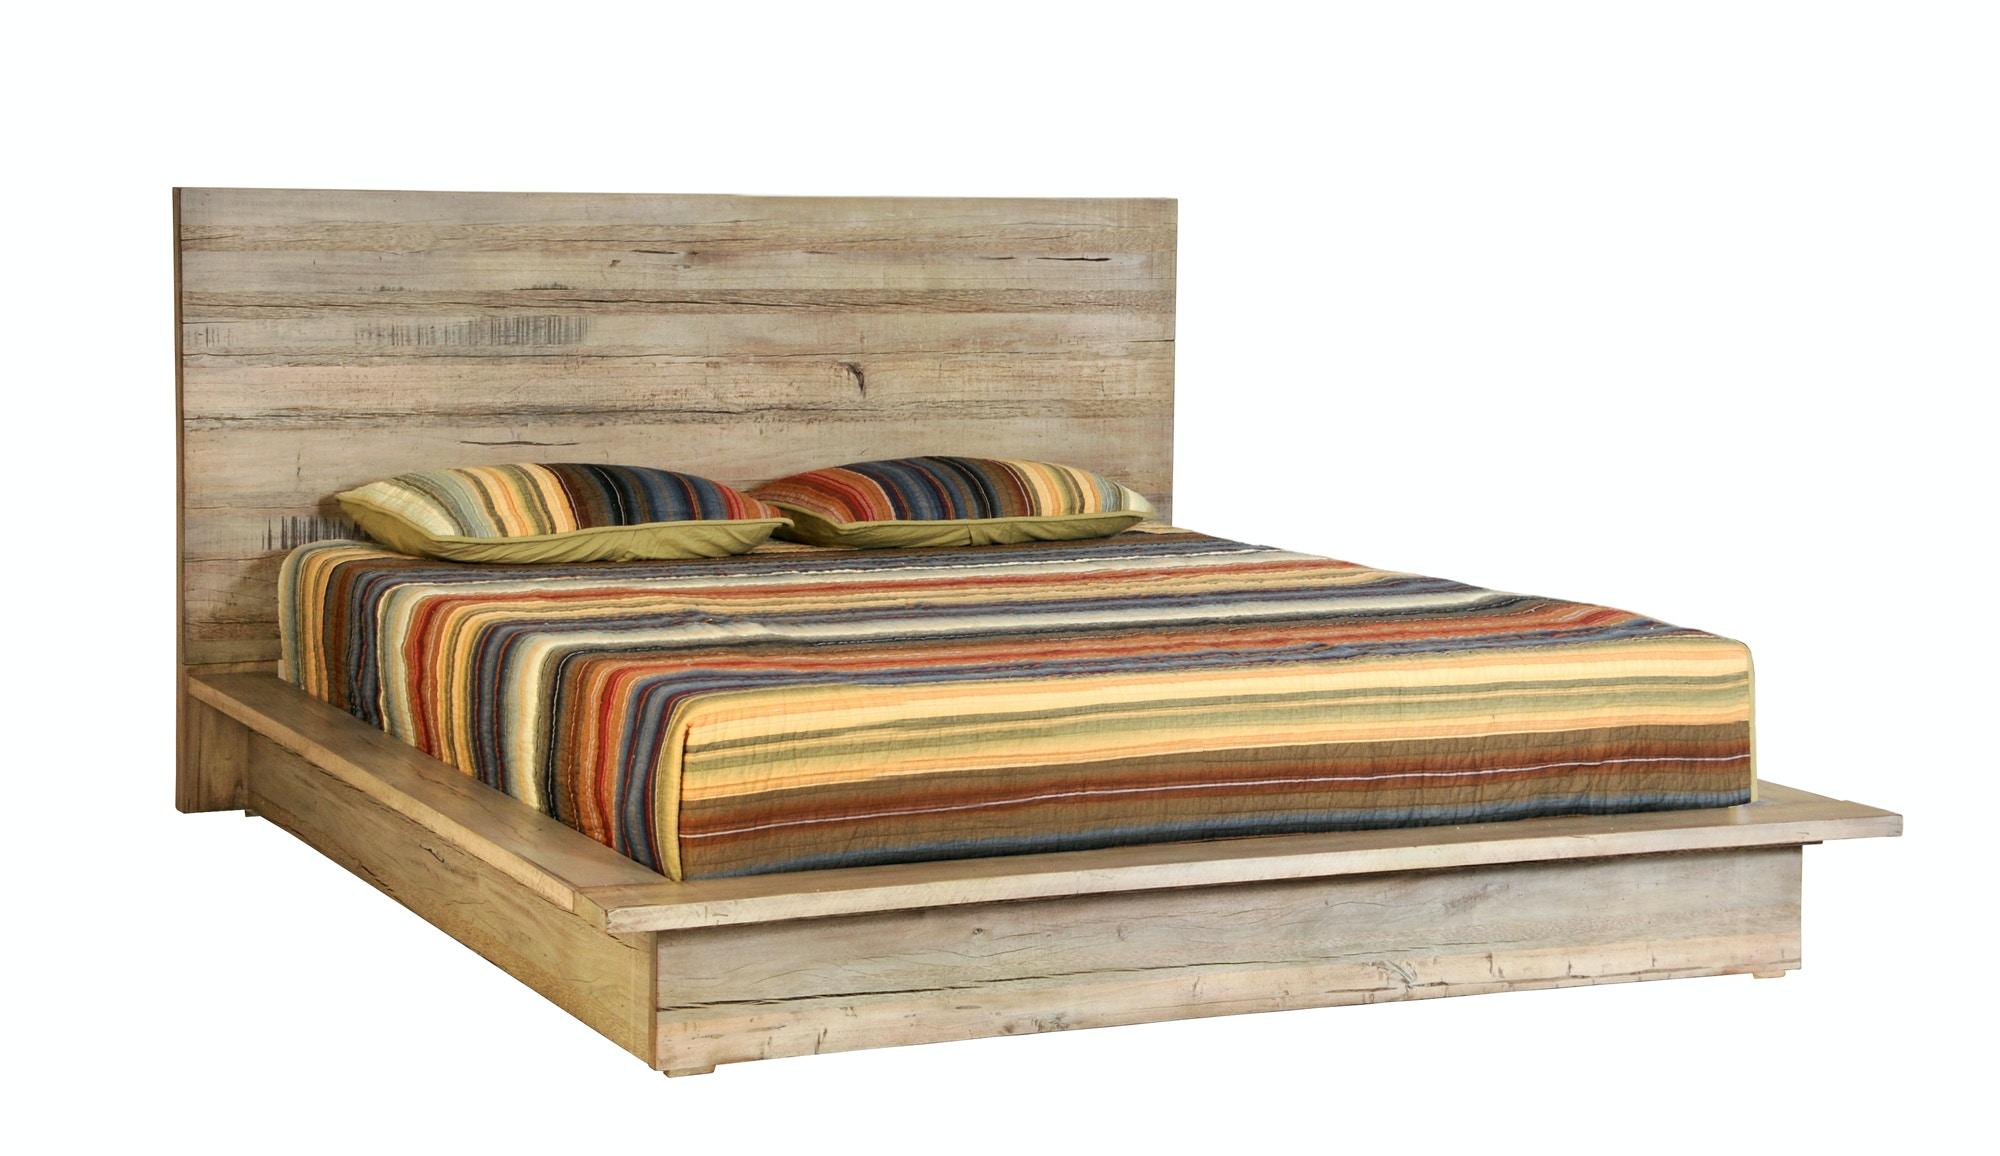 Napa Furniture Designs Renewal Bedroom Group Queen 213108 Furniture Fair Cincinnati